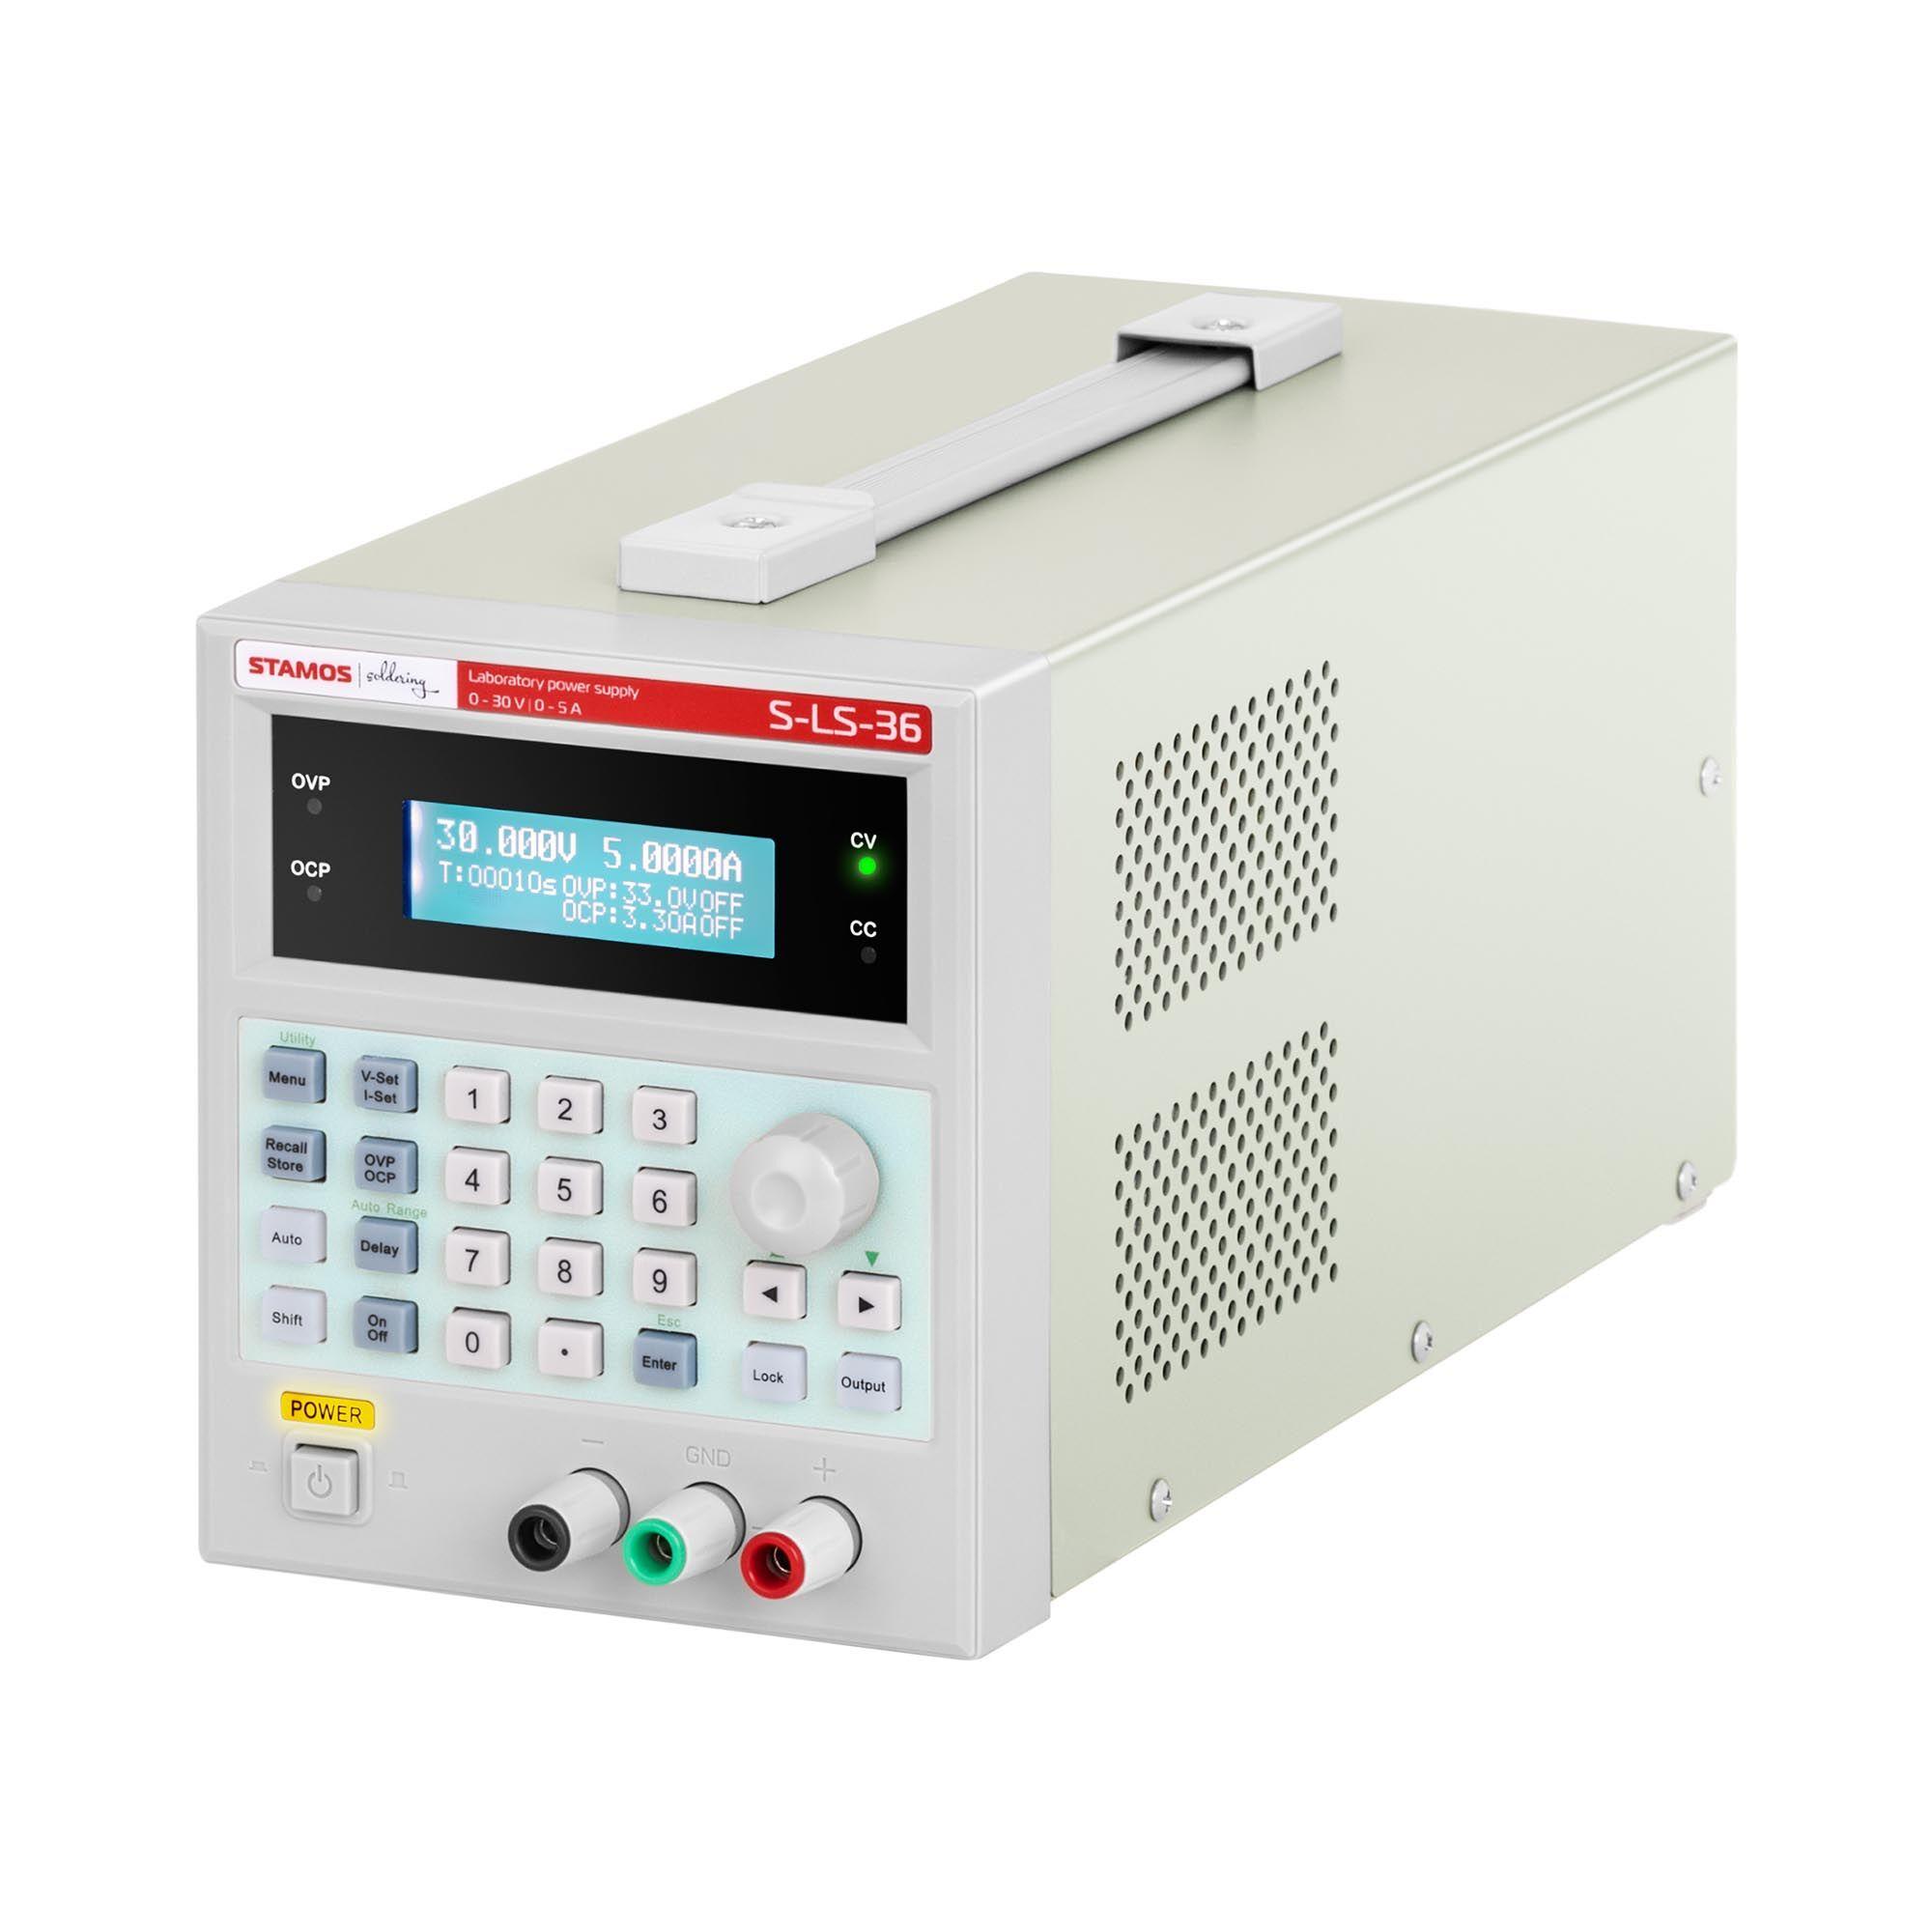 stamos soldering alimentatore da banco - 0-30 v - 0-5 a cc - 150 w - usb - 100 posti memoria s-ls-36